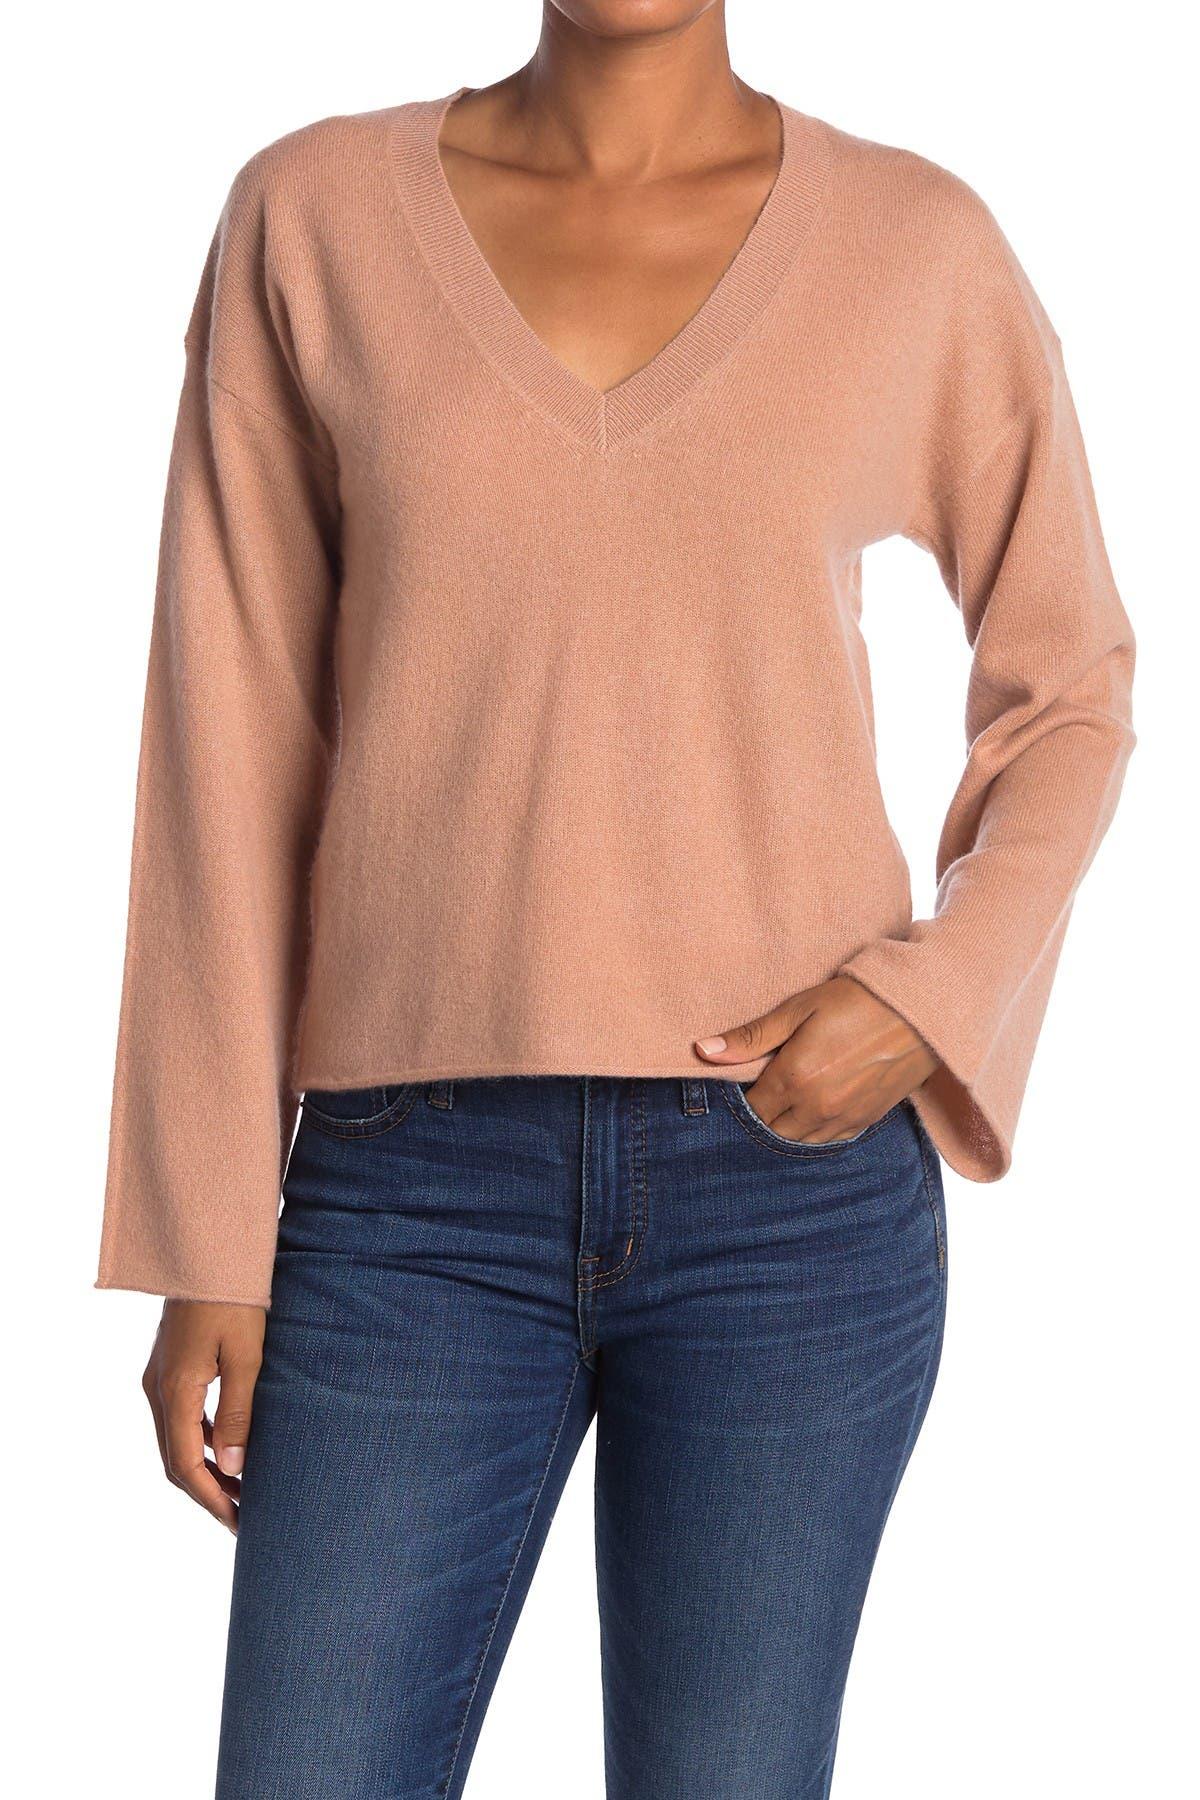 Image of 360 Cashmere Phoebe V-Neck Bell Sleeve Cashmere Sweater